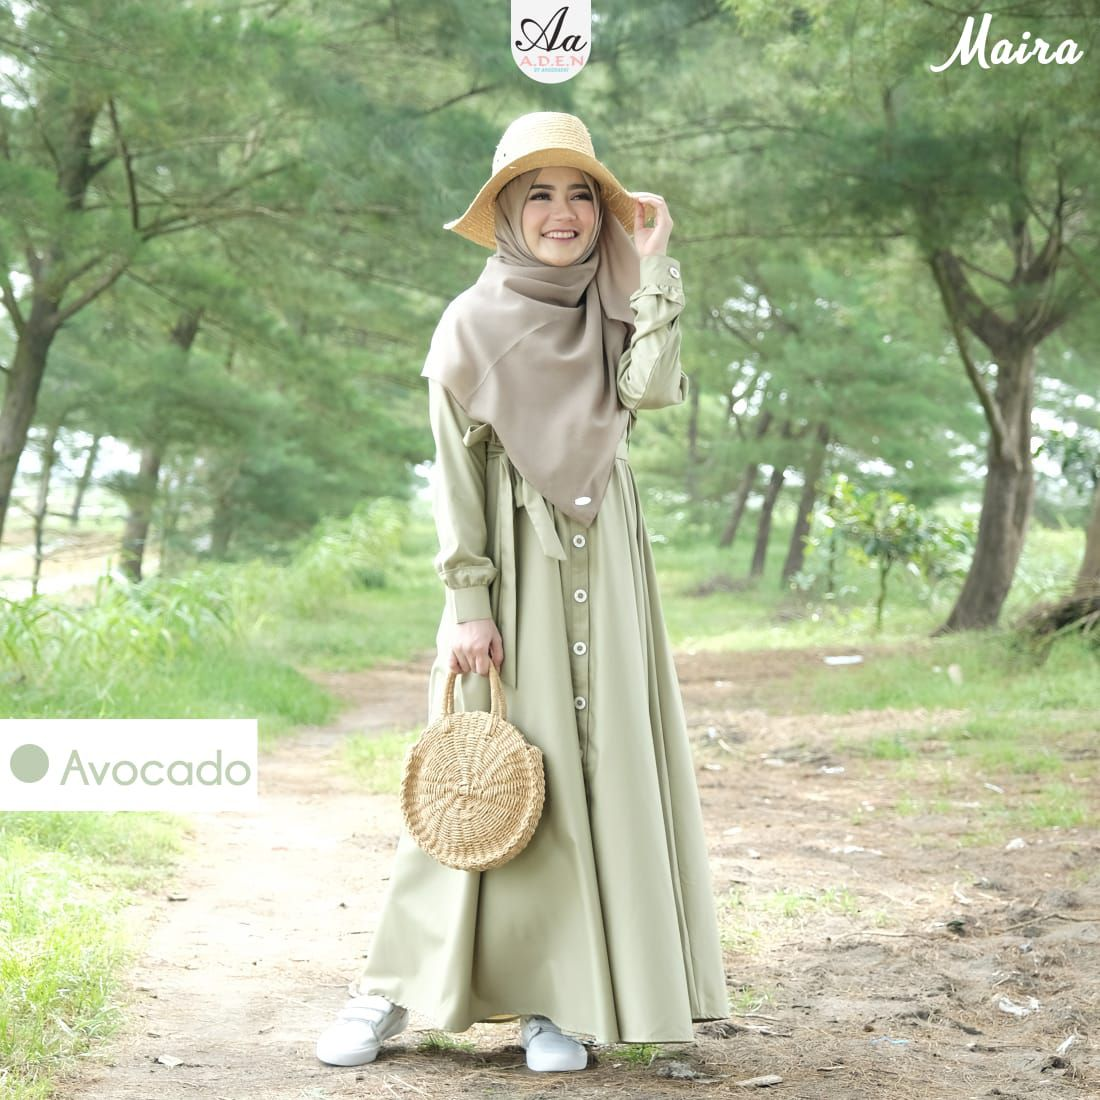 Gamis Dress Syari Maira Series By A D E N Hijab Dress Only Lazada Indonesia